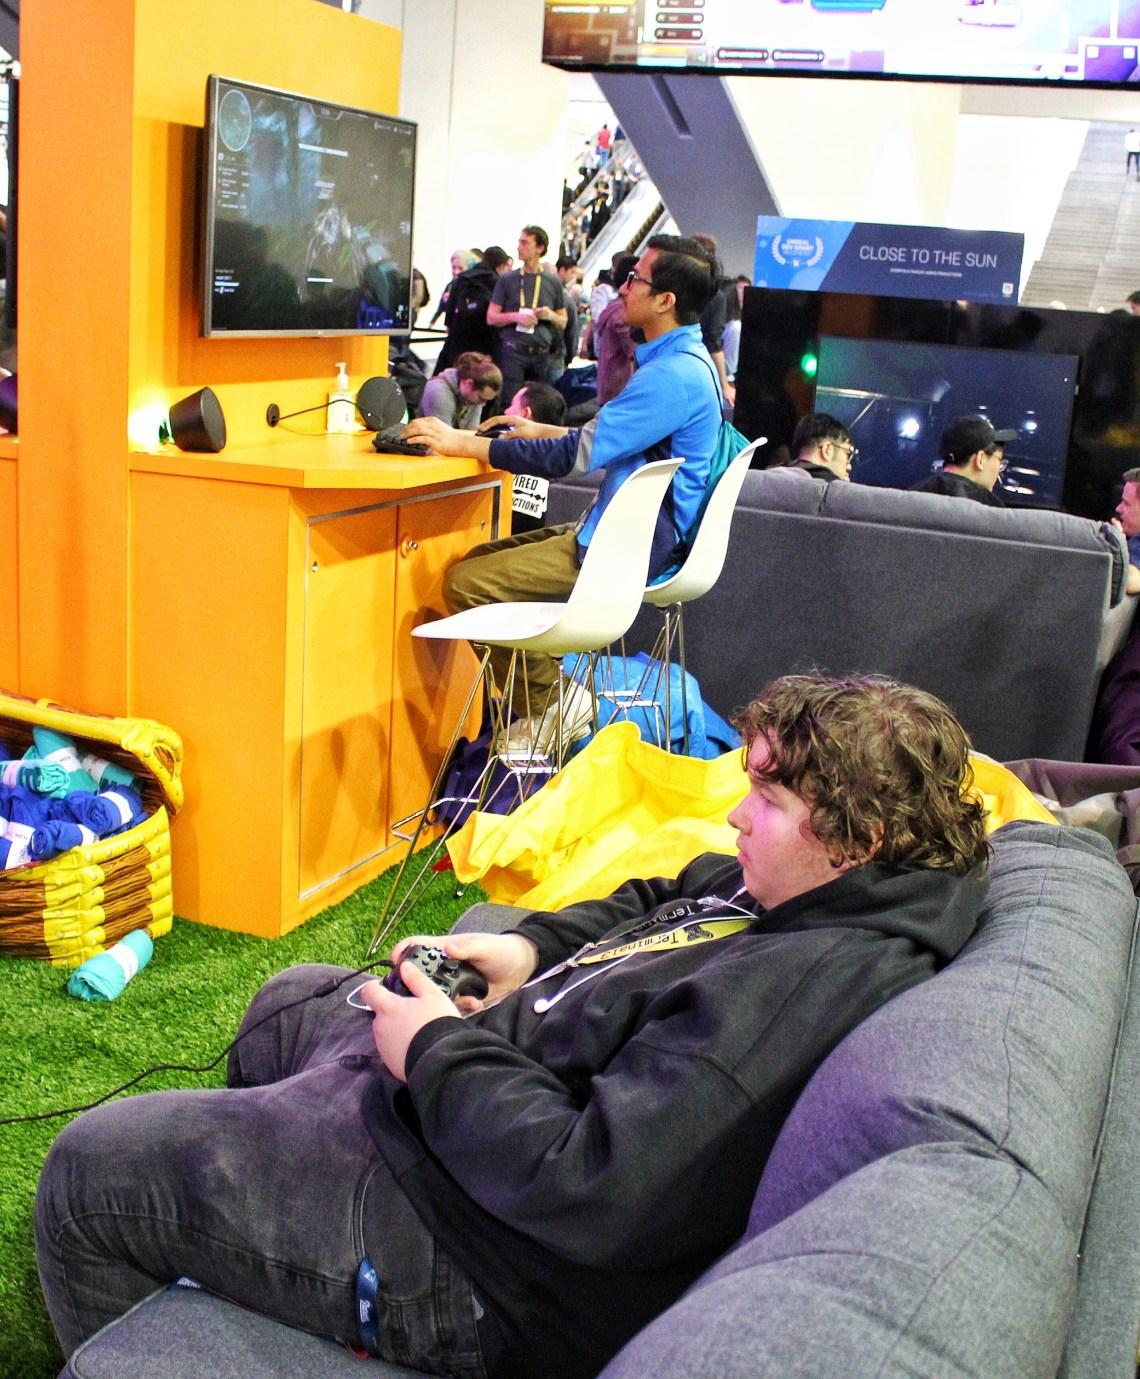 Epic Games GDC 2019 8Bit/Digi Insight for Bay Area Gamers